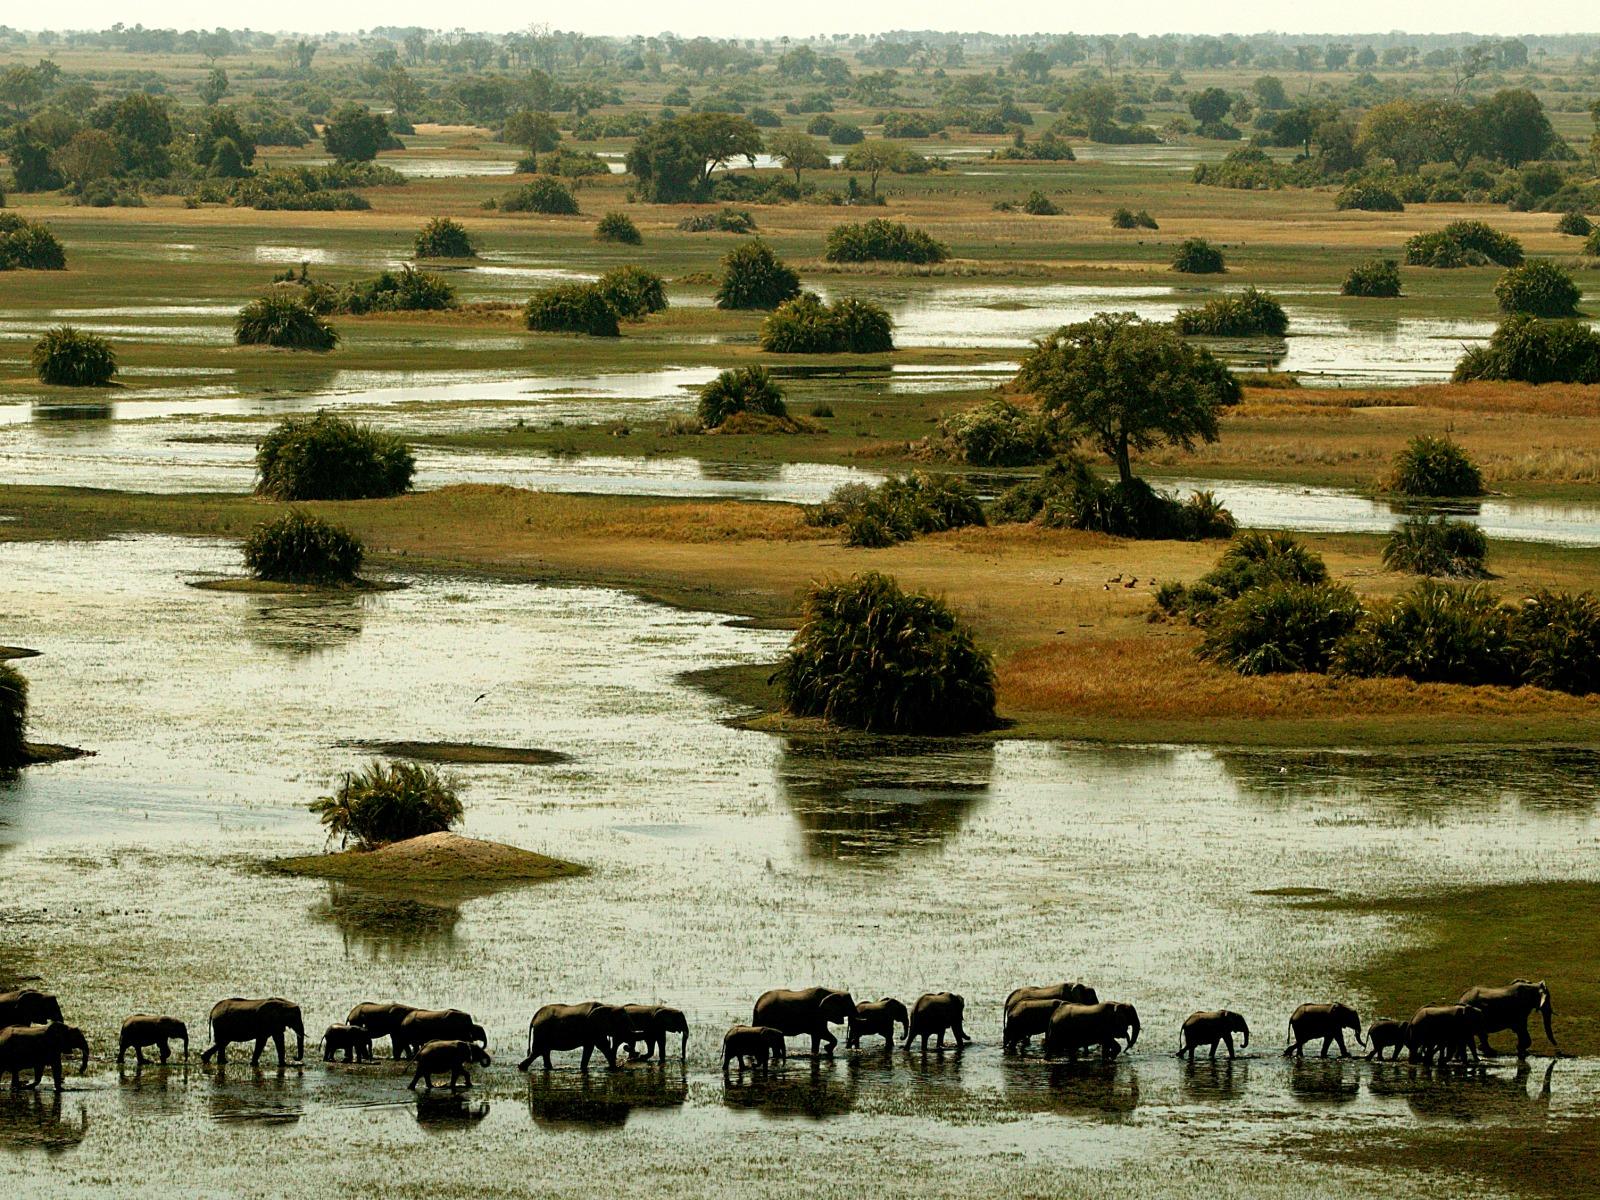 Wilderness SafariCF9U1193a_1600x1200.jpg